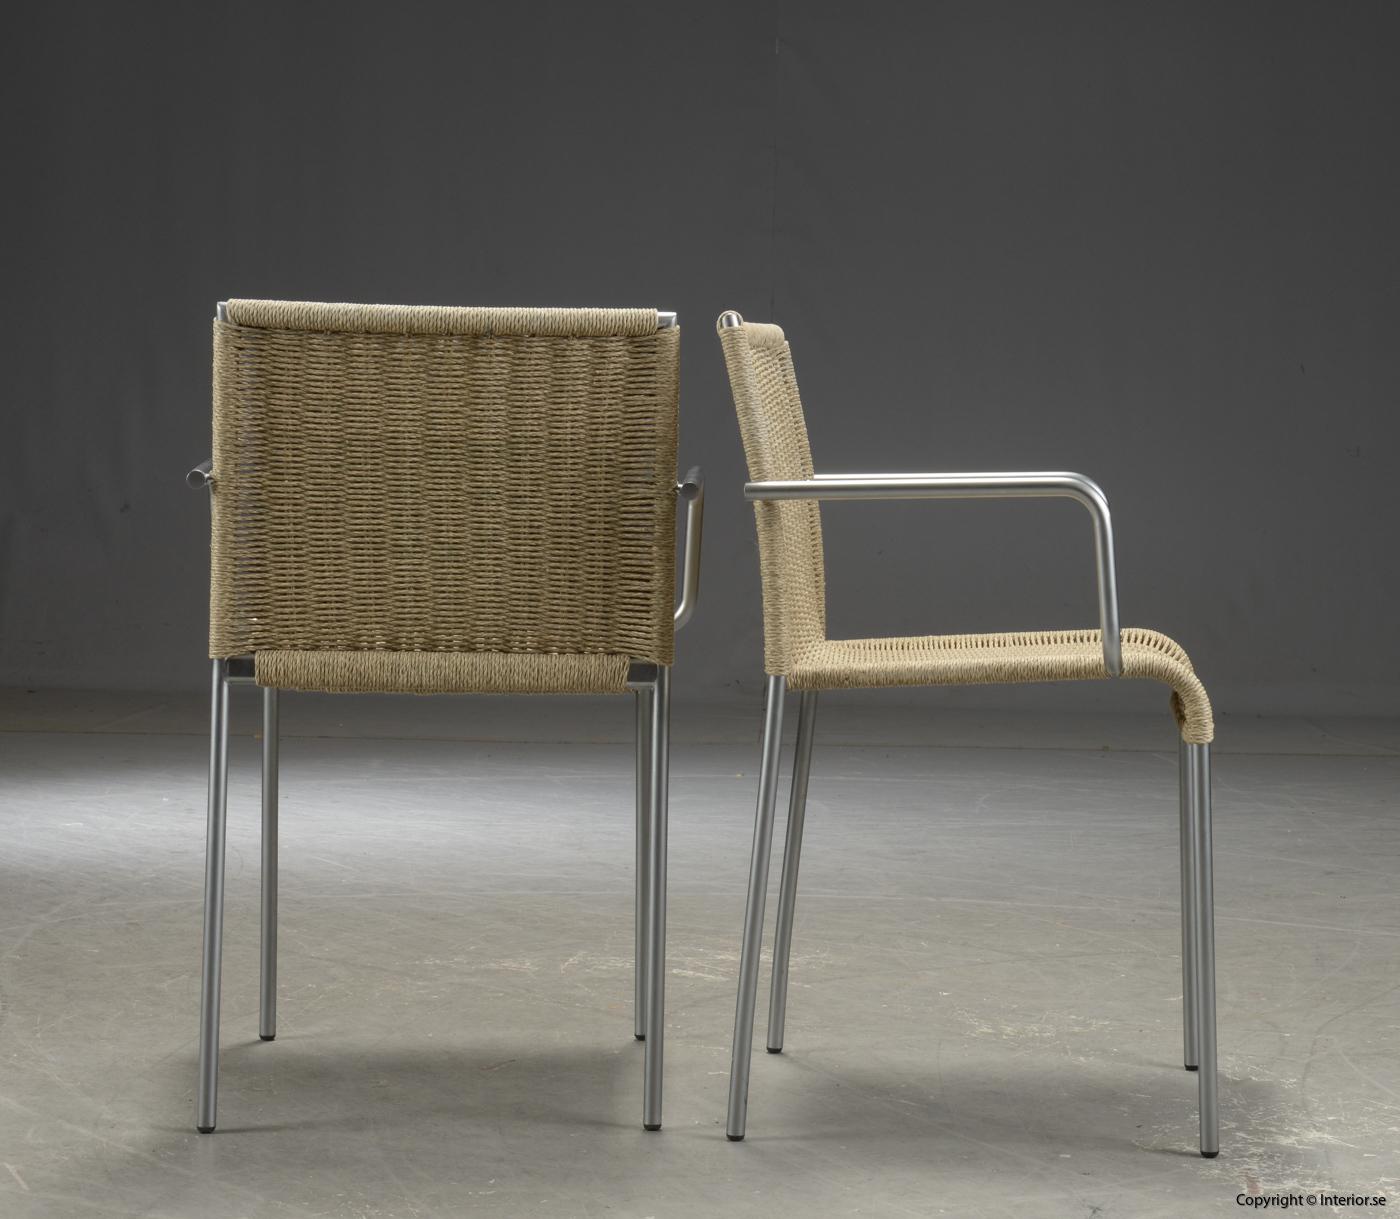 Stolar med armstöd CHAIRS WITH ARMREST , Accademia Agra - Enrico Franzolini 4